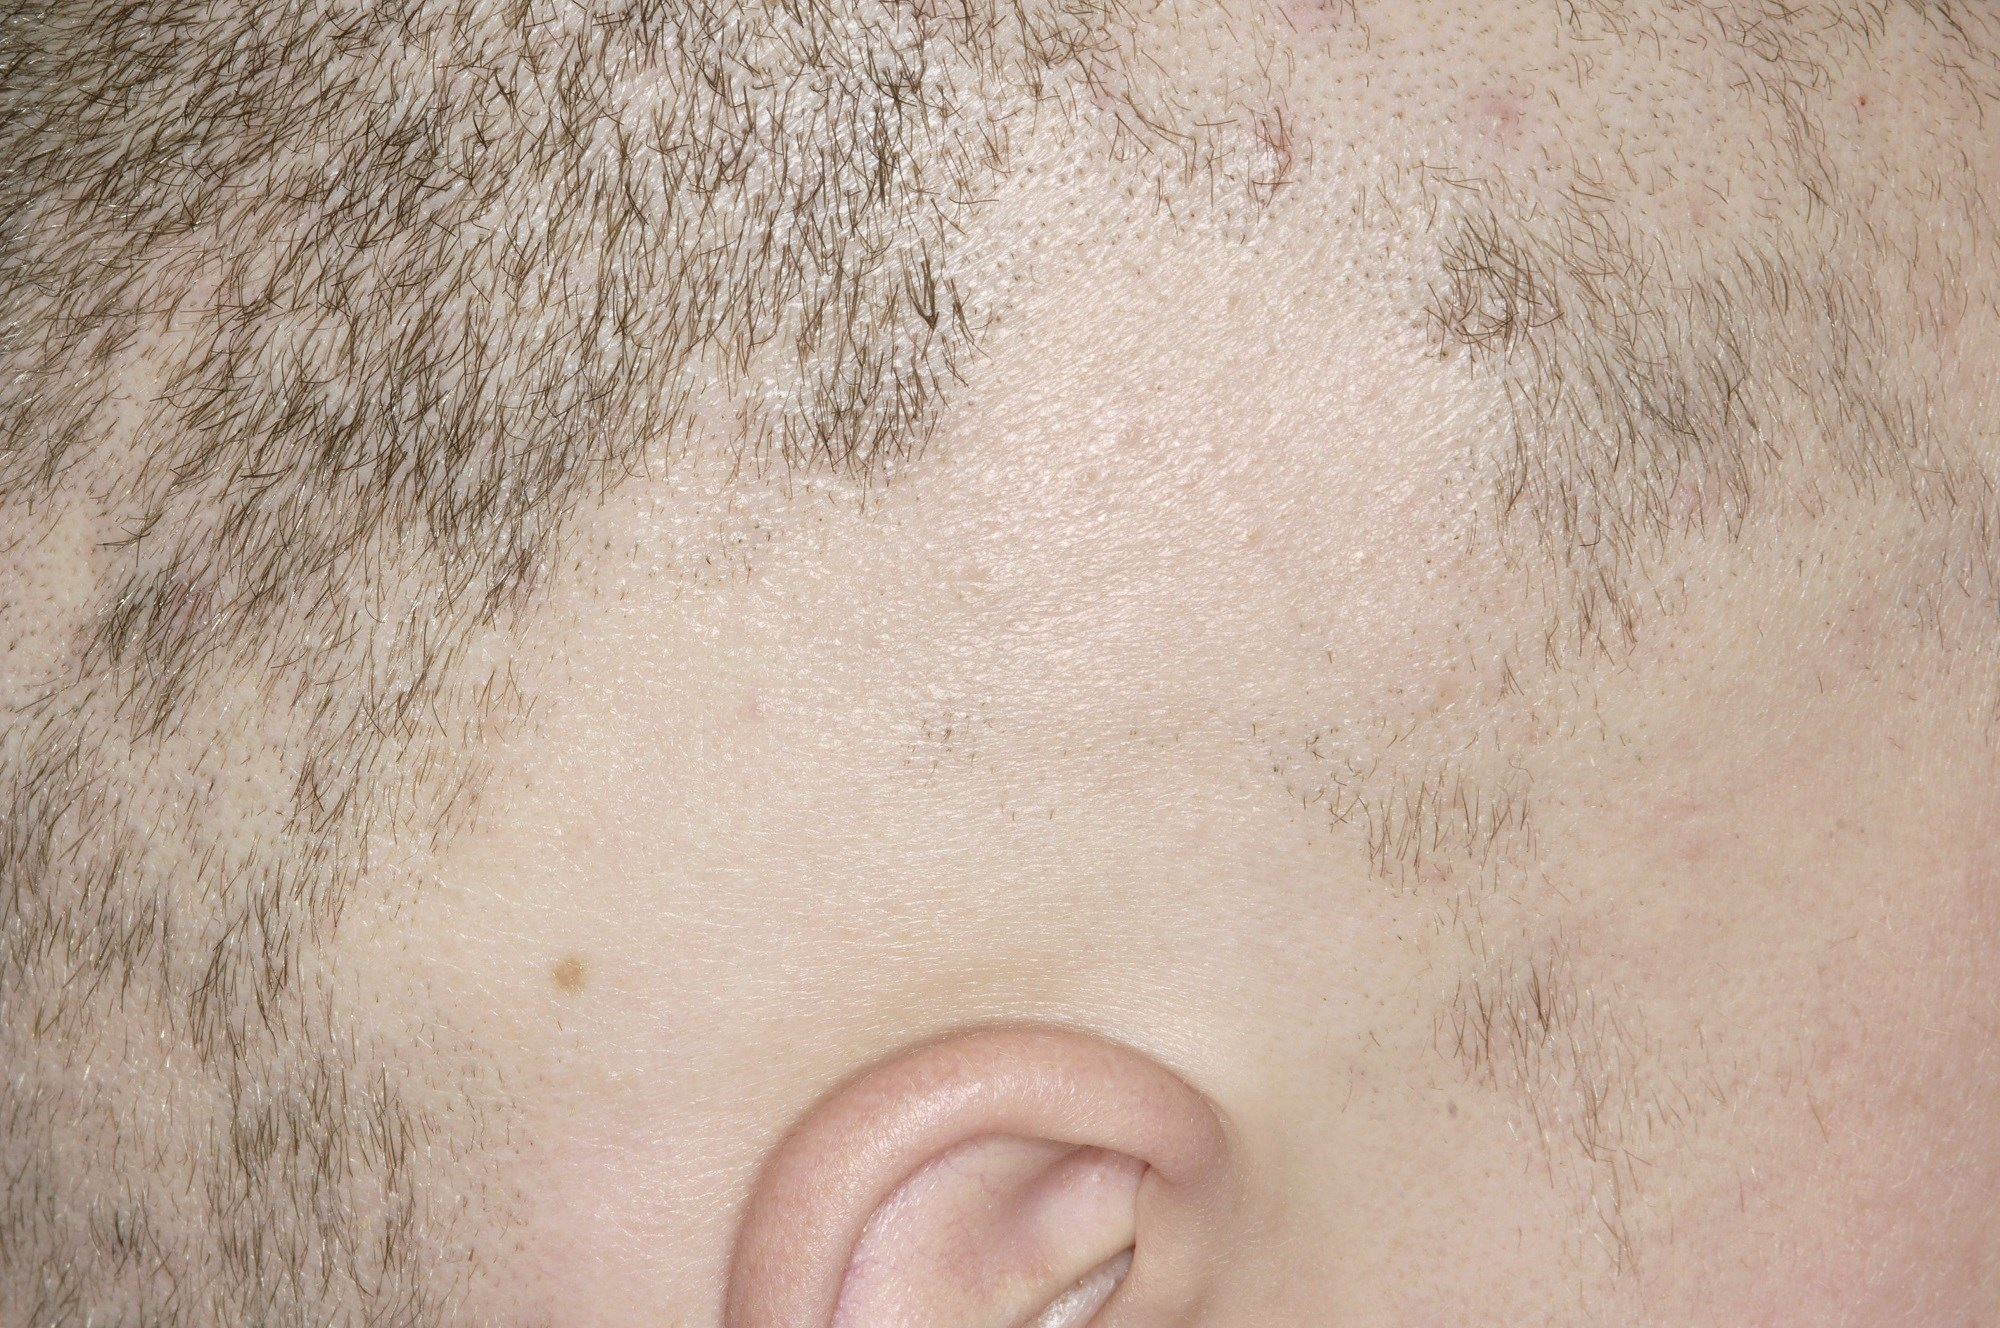 Low-Dose Ruxolitinib May Promote Hair Regrowth in Severe Alopecia